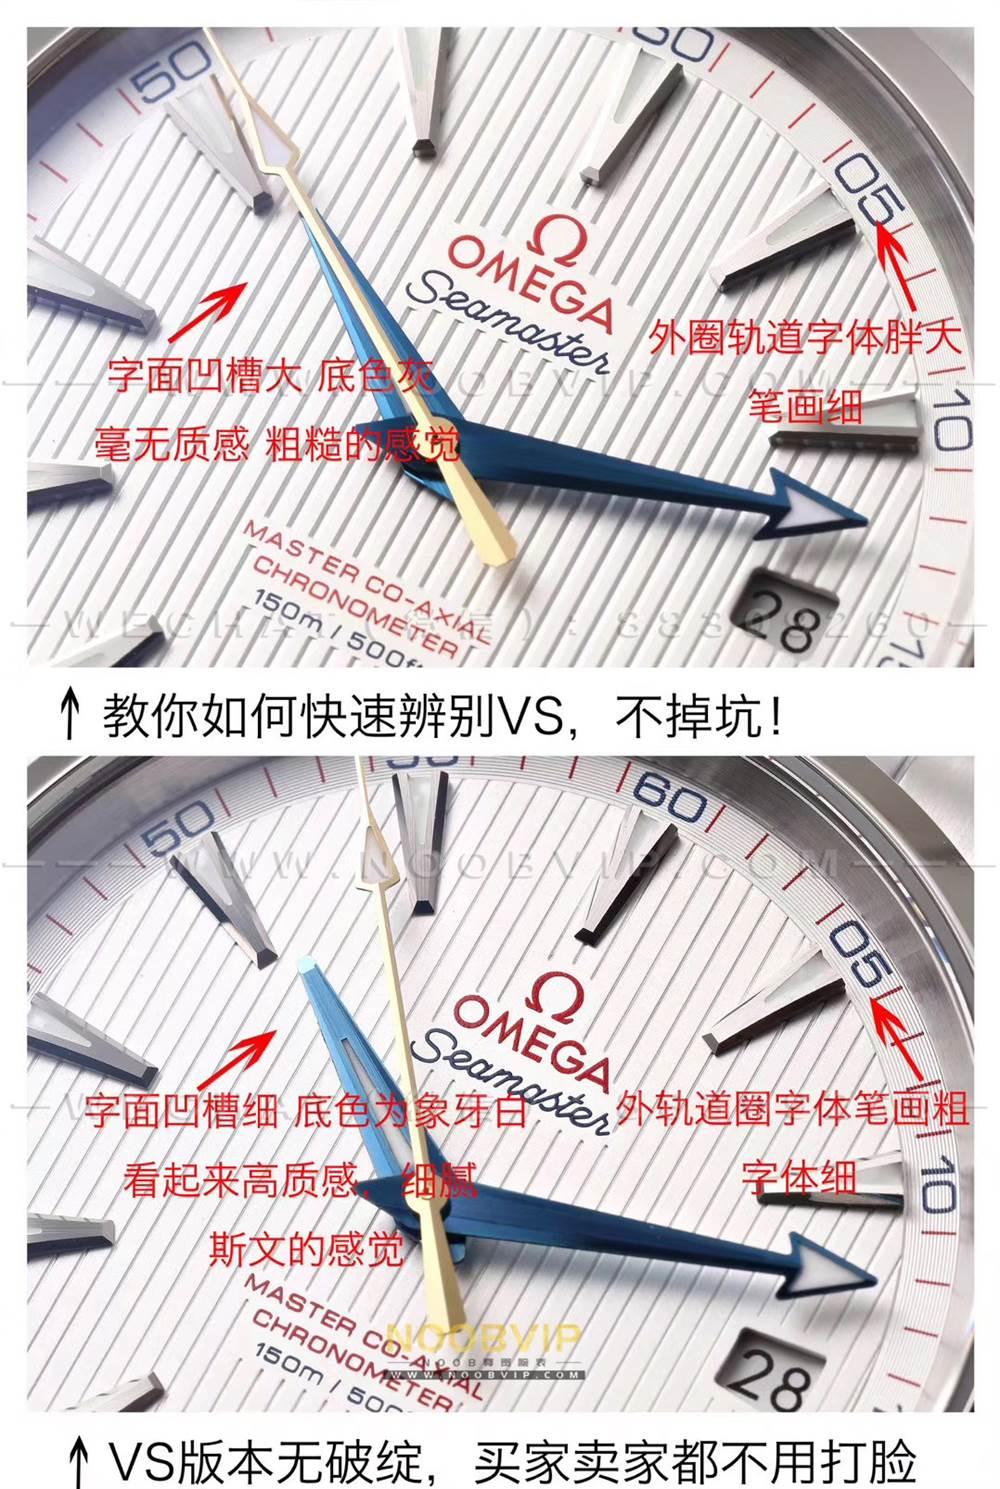 VS厂欧米茄海马150金针队长对比市场版本评测-您买对版本了吗